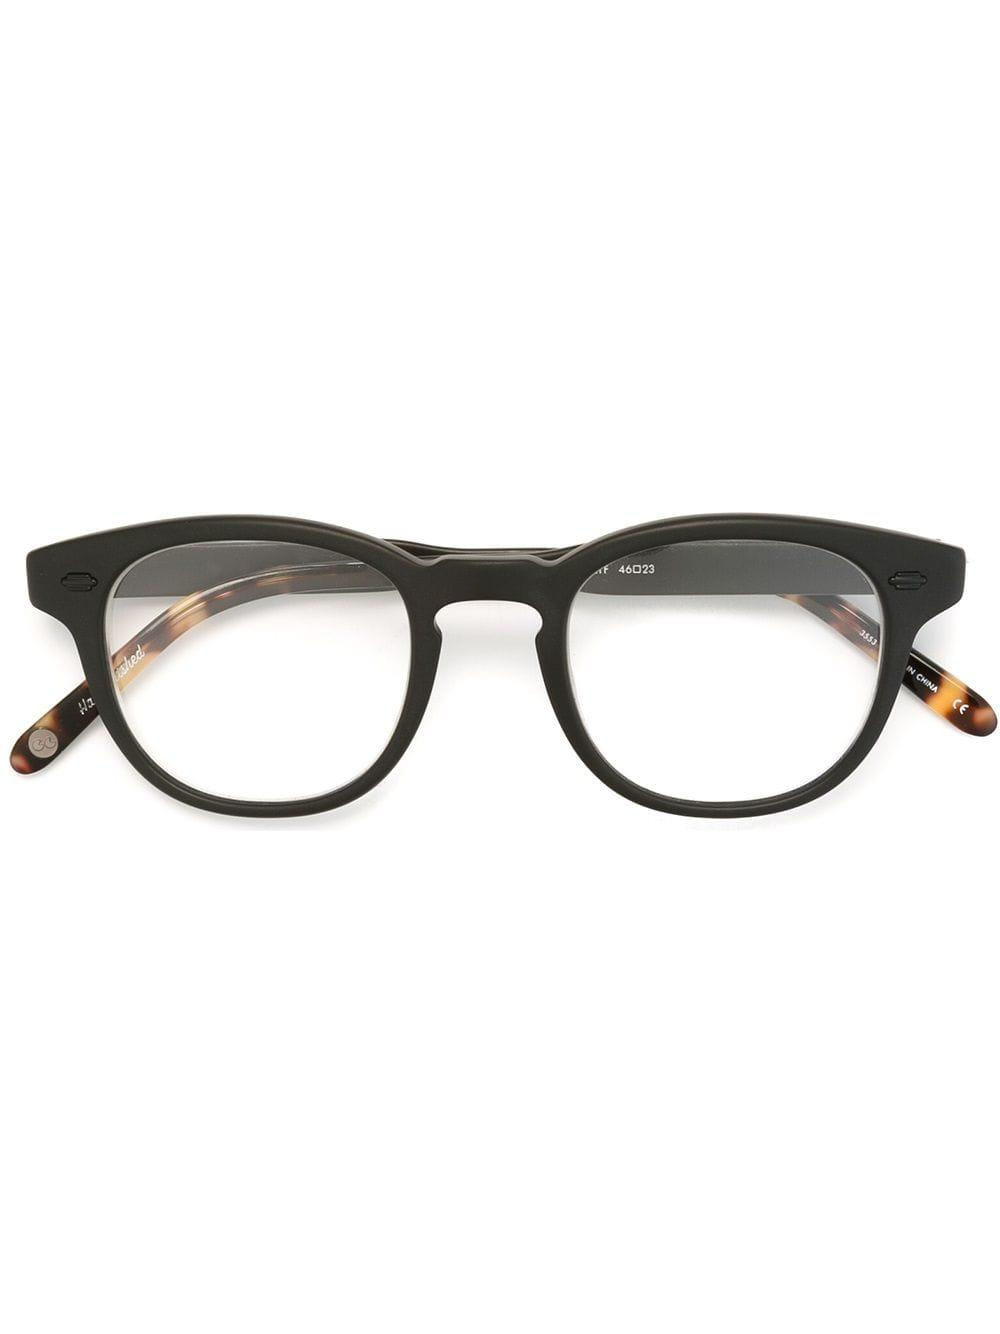 18a5dde904 Lyst - Garrett Leight Matte  warren  Optical Glasses in Black for Men